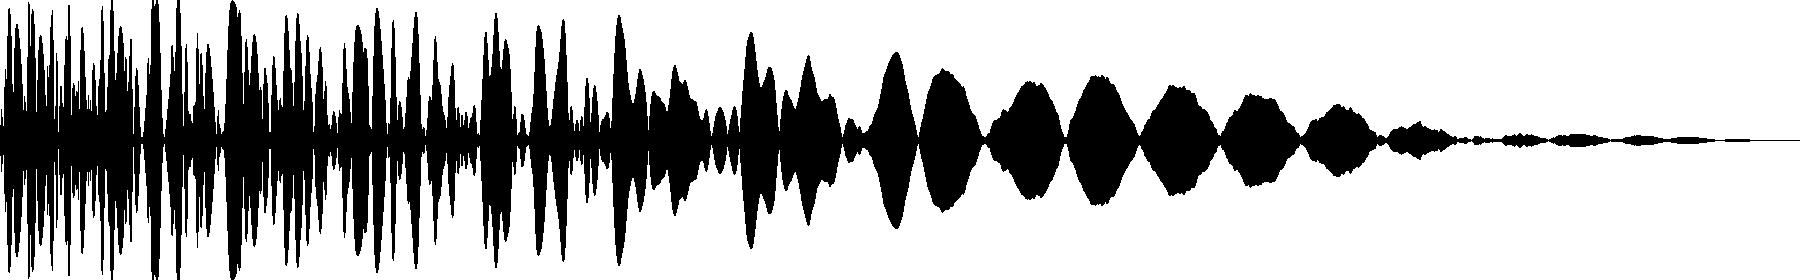 vedh synth cut 017 cm9